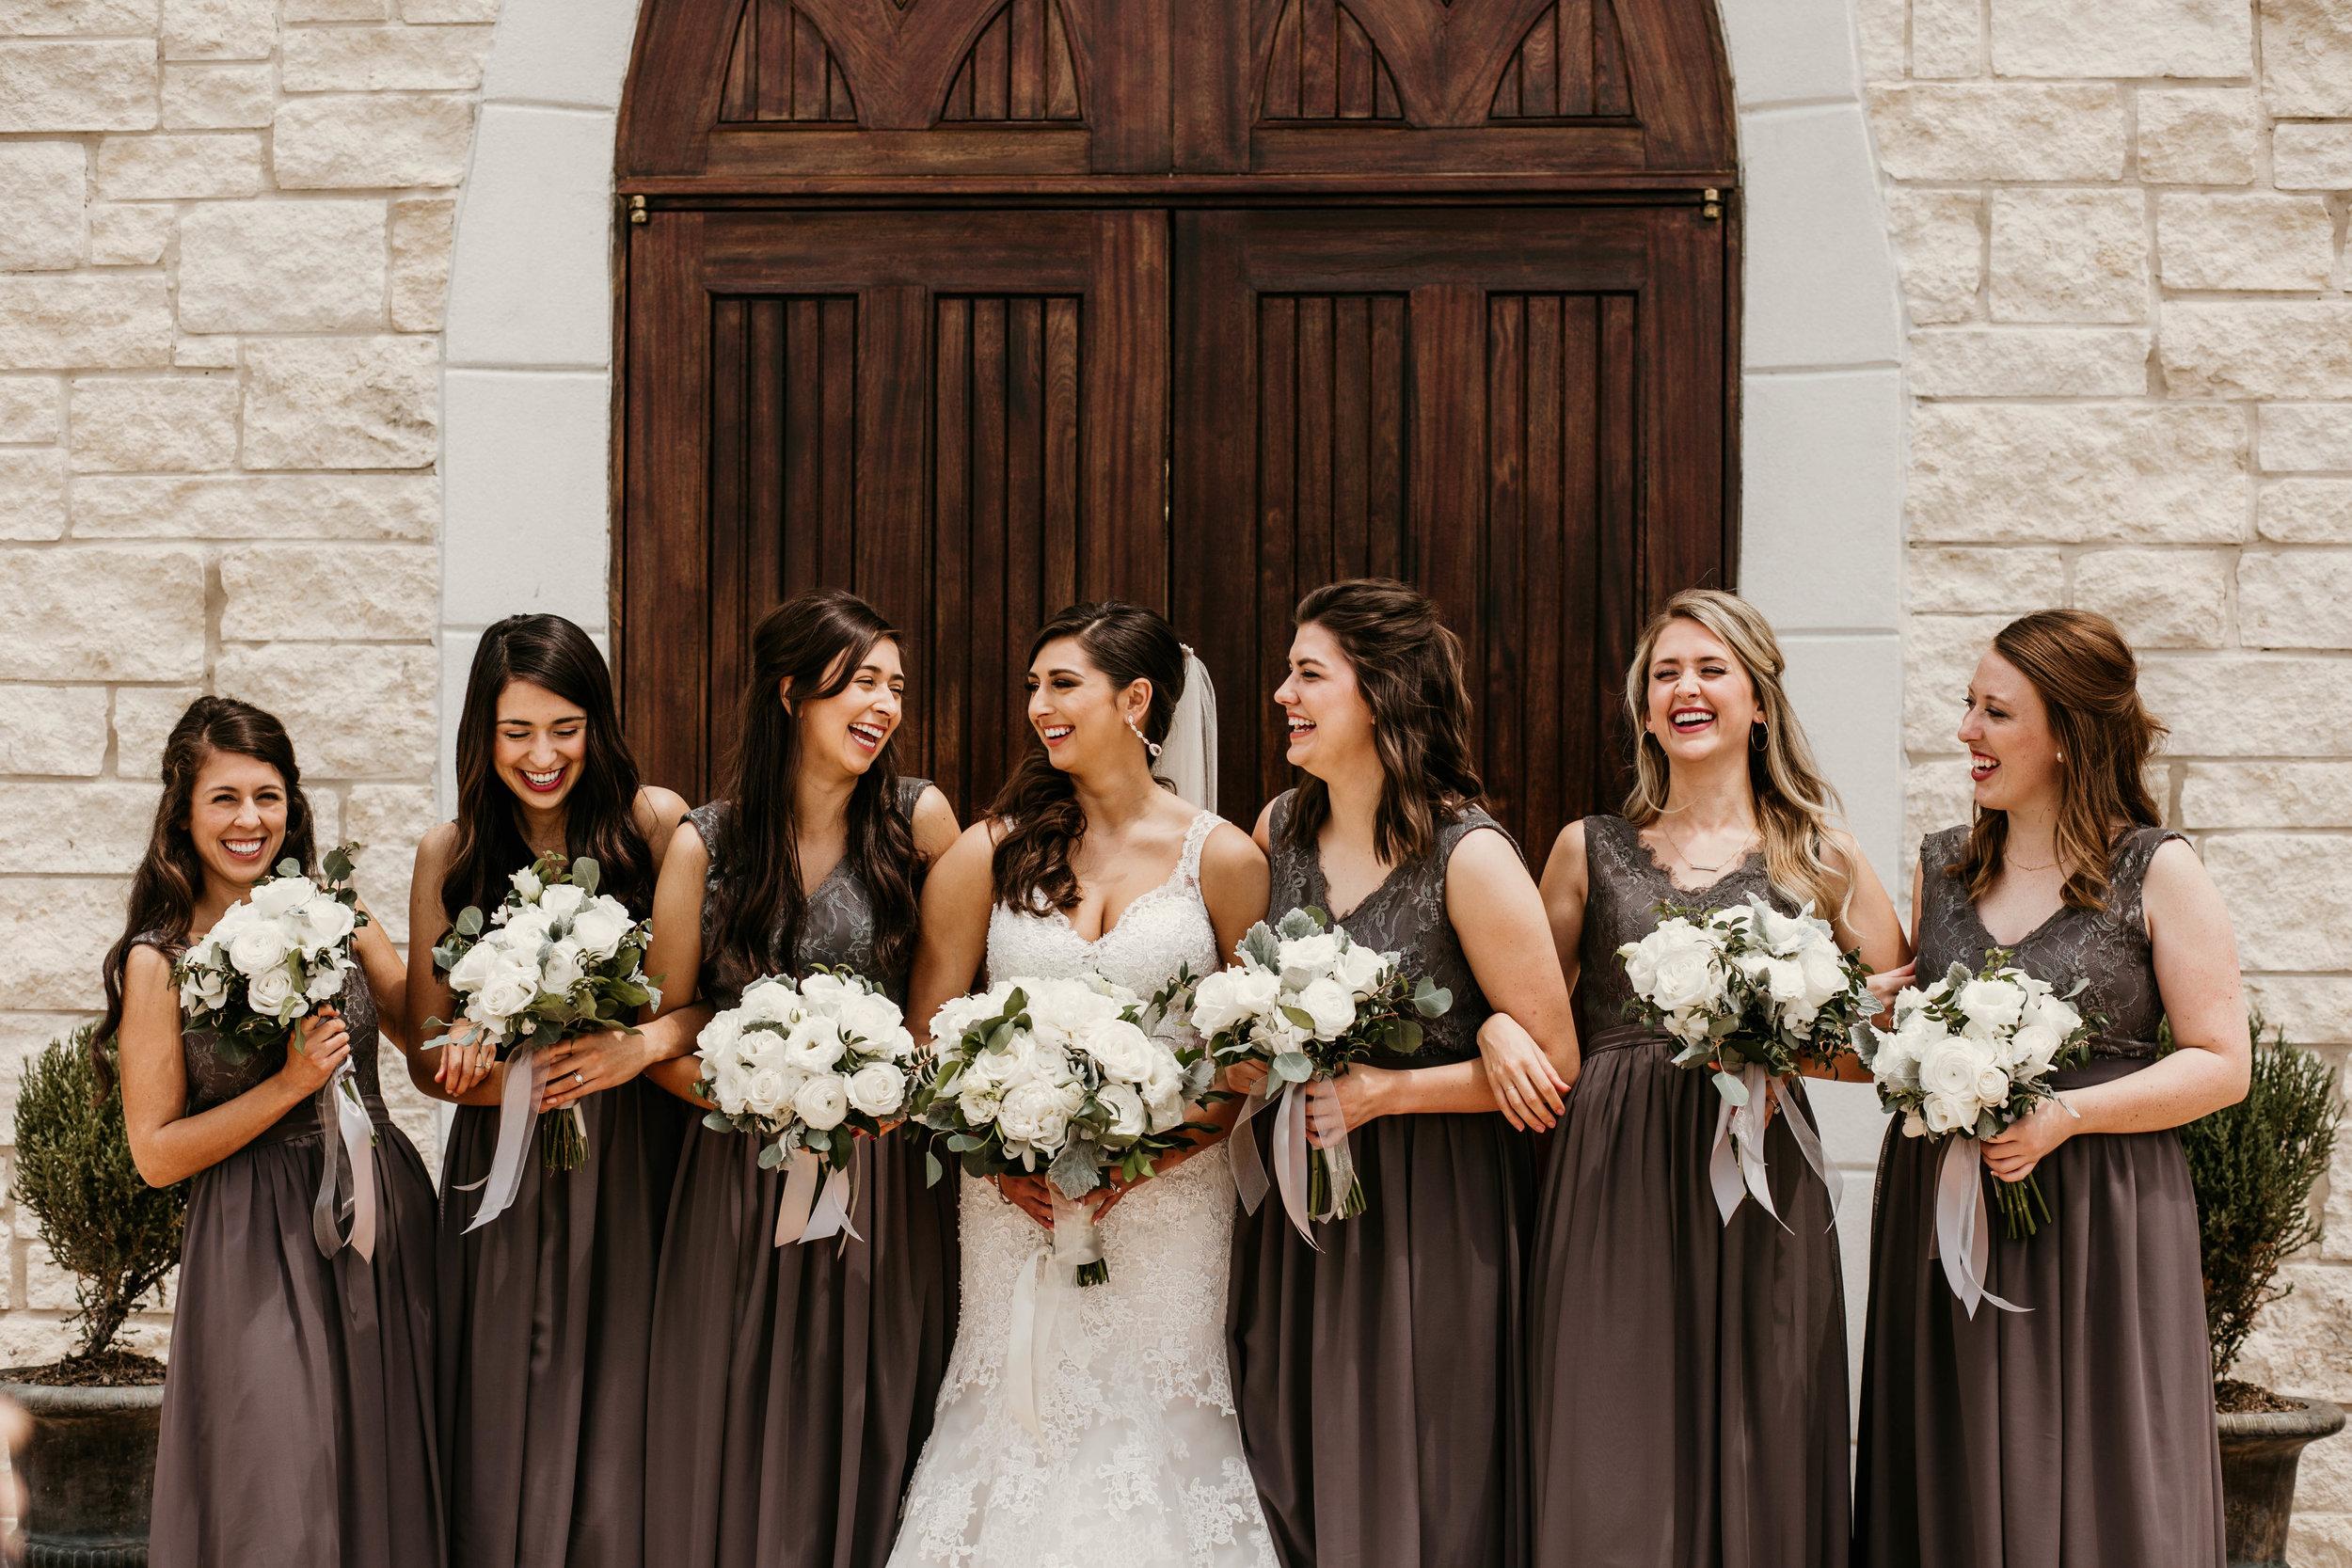 sarah_jason_ashton_gardens_west_houston_wedding-43.jpg